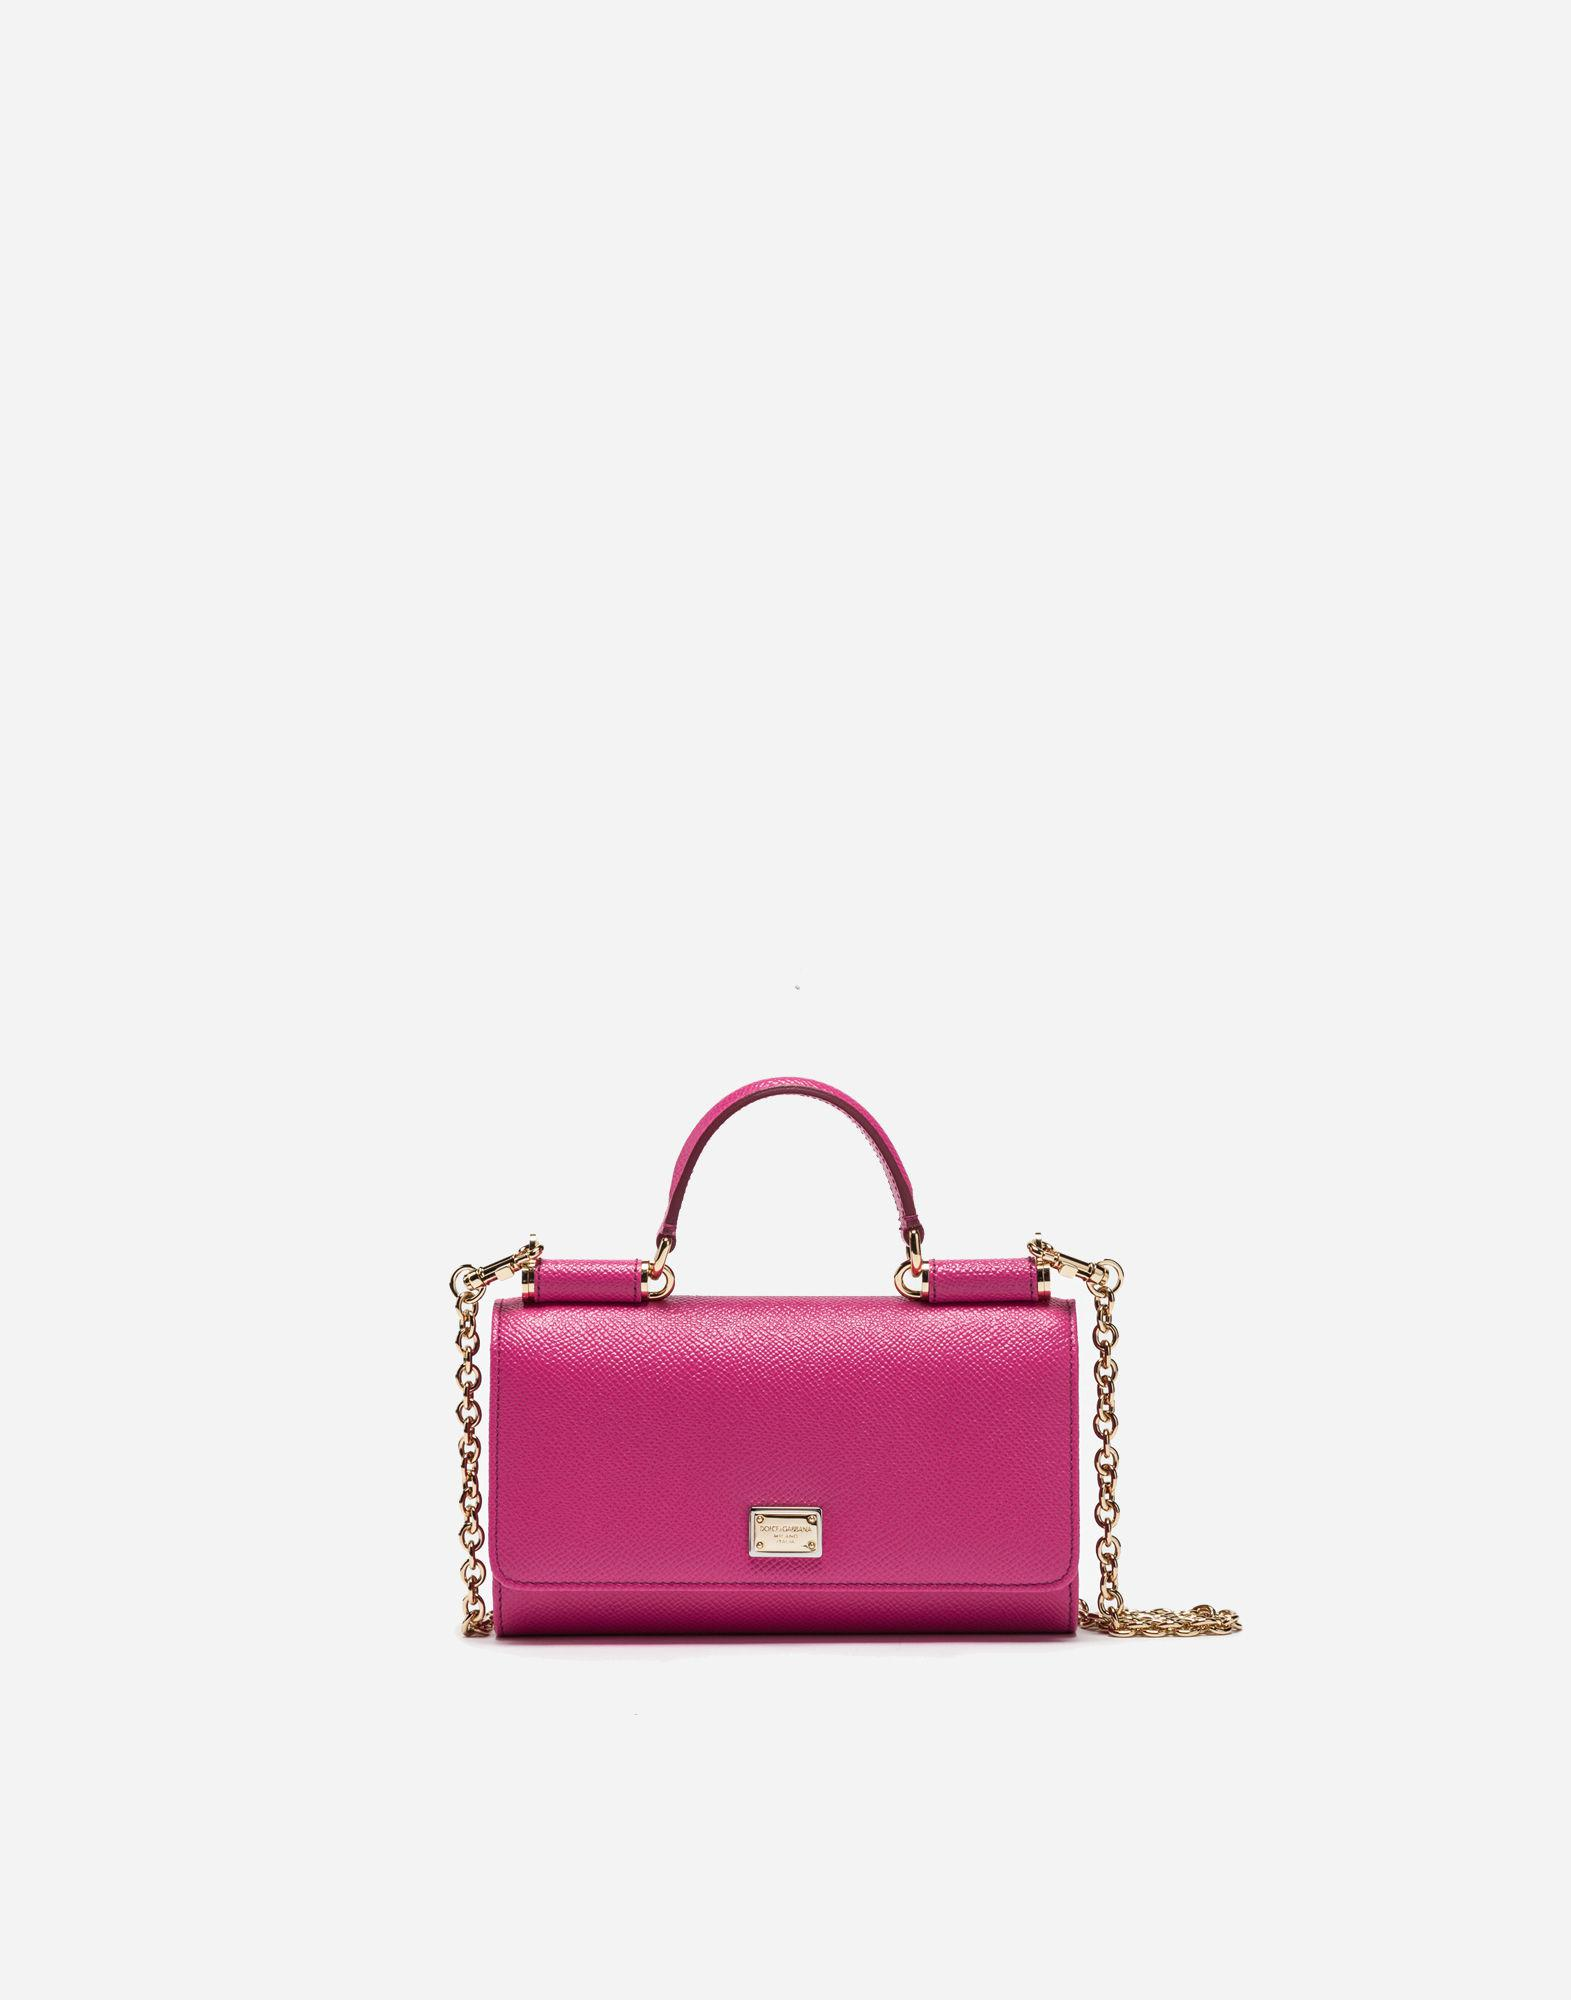 afb3aada4a Lyst - Dolce   Gabbana Min Von Bag In Dauphine Leather in Pink